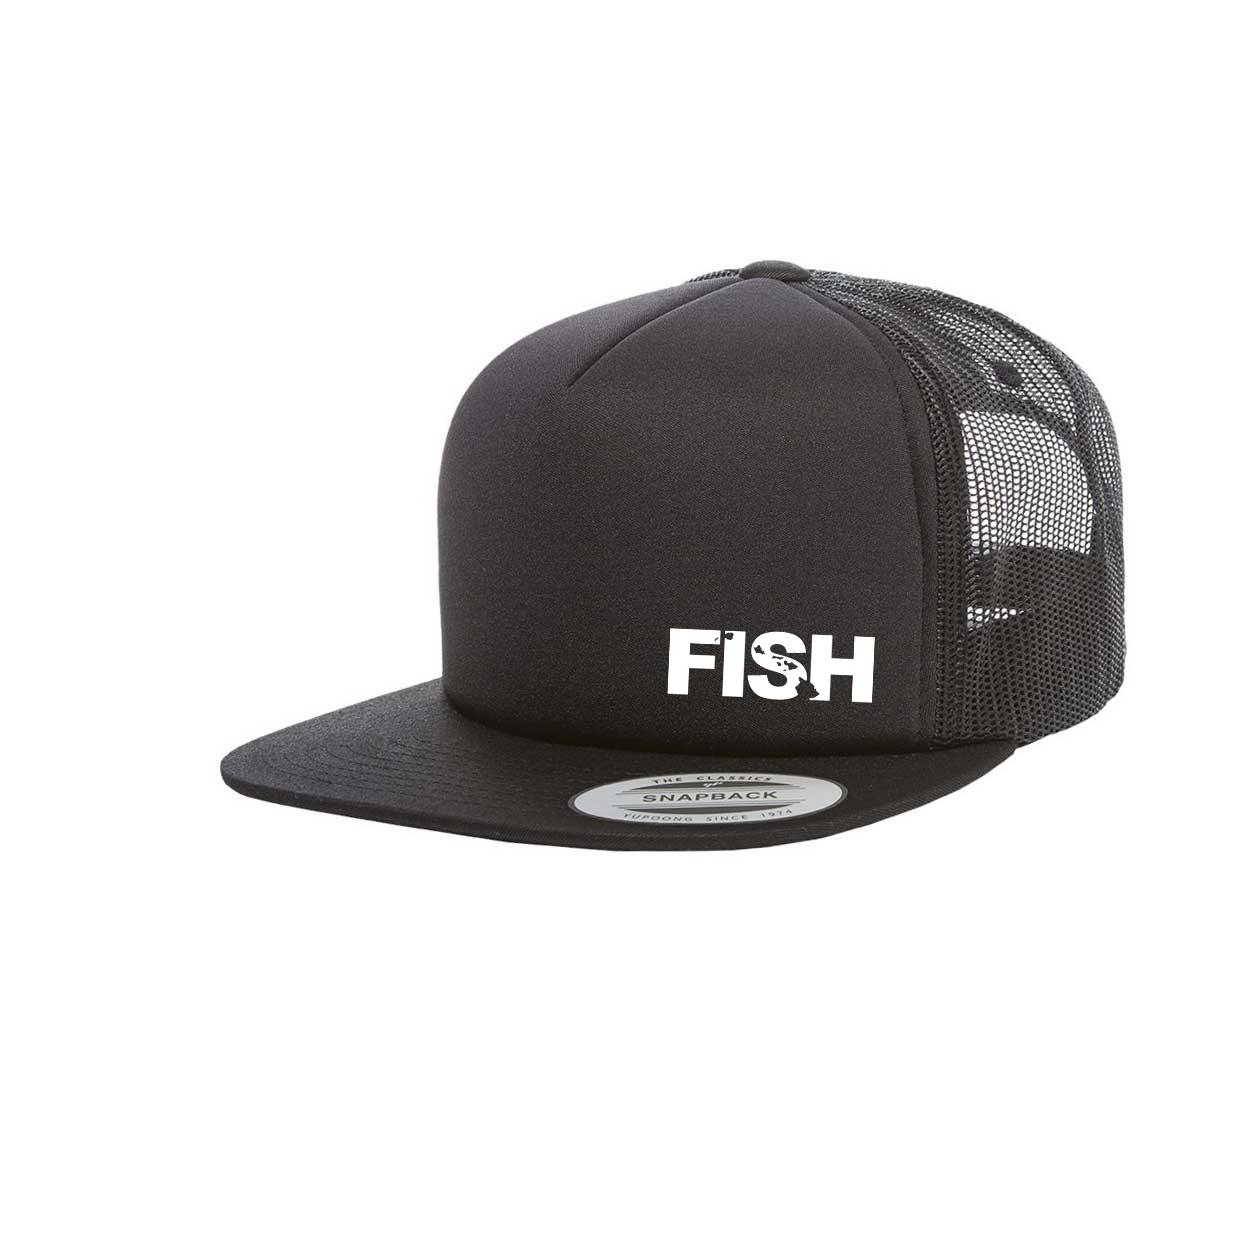 Fish Hawaii Night Out Premium Foam Flat Brim Snapback Hat Black (White Logo)